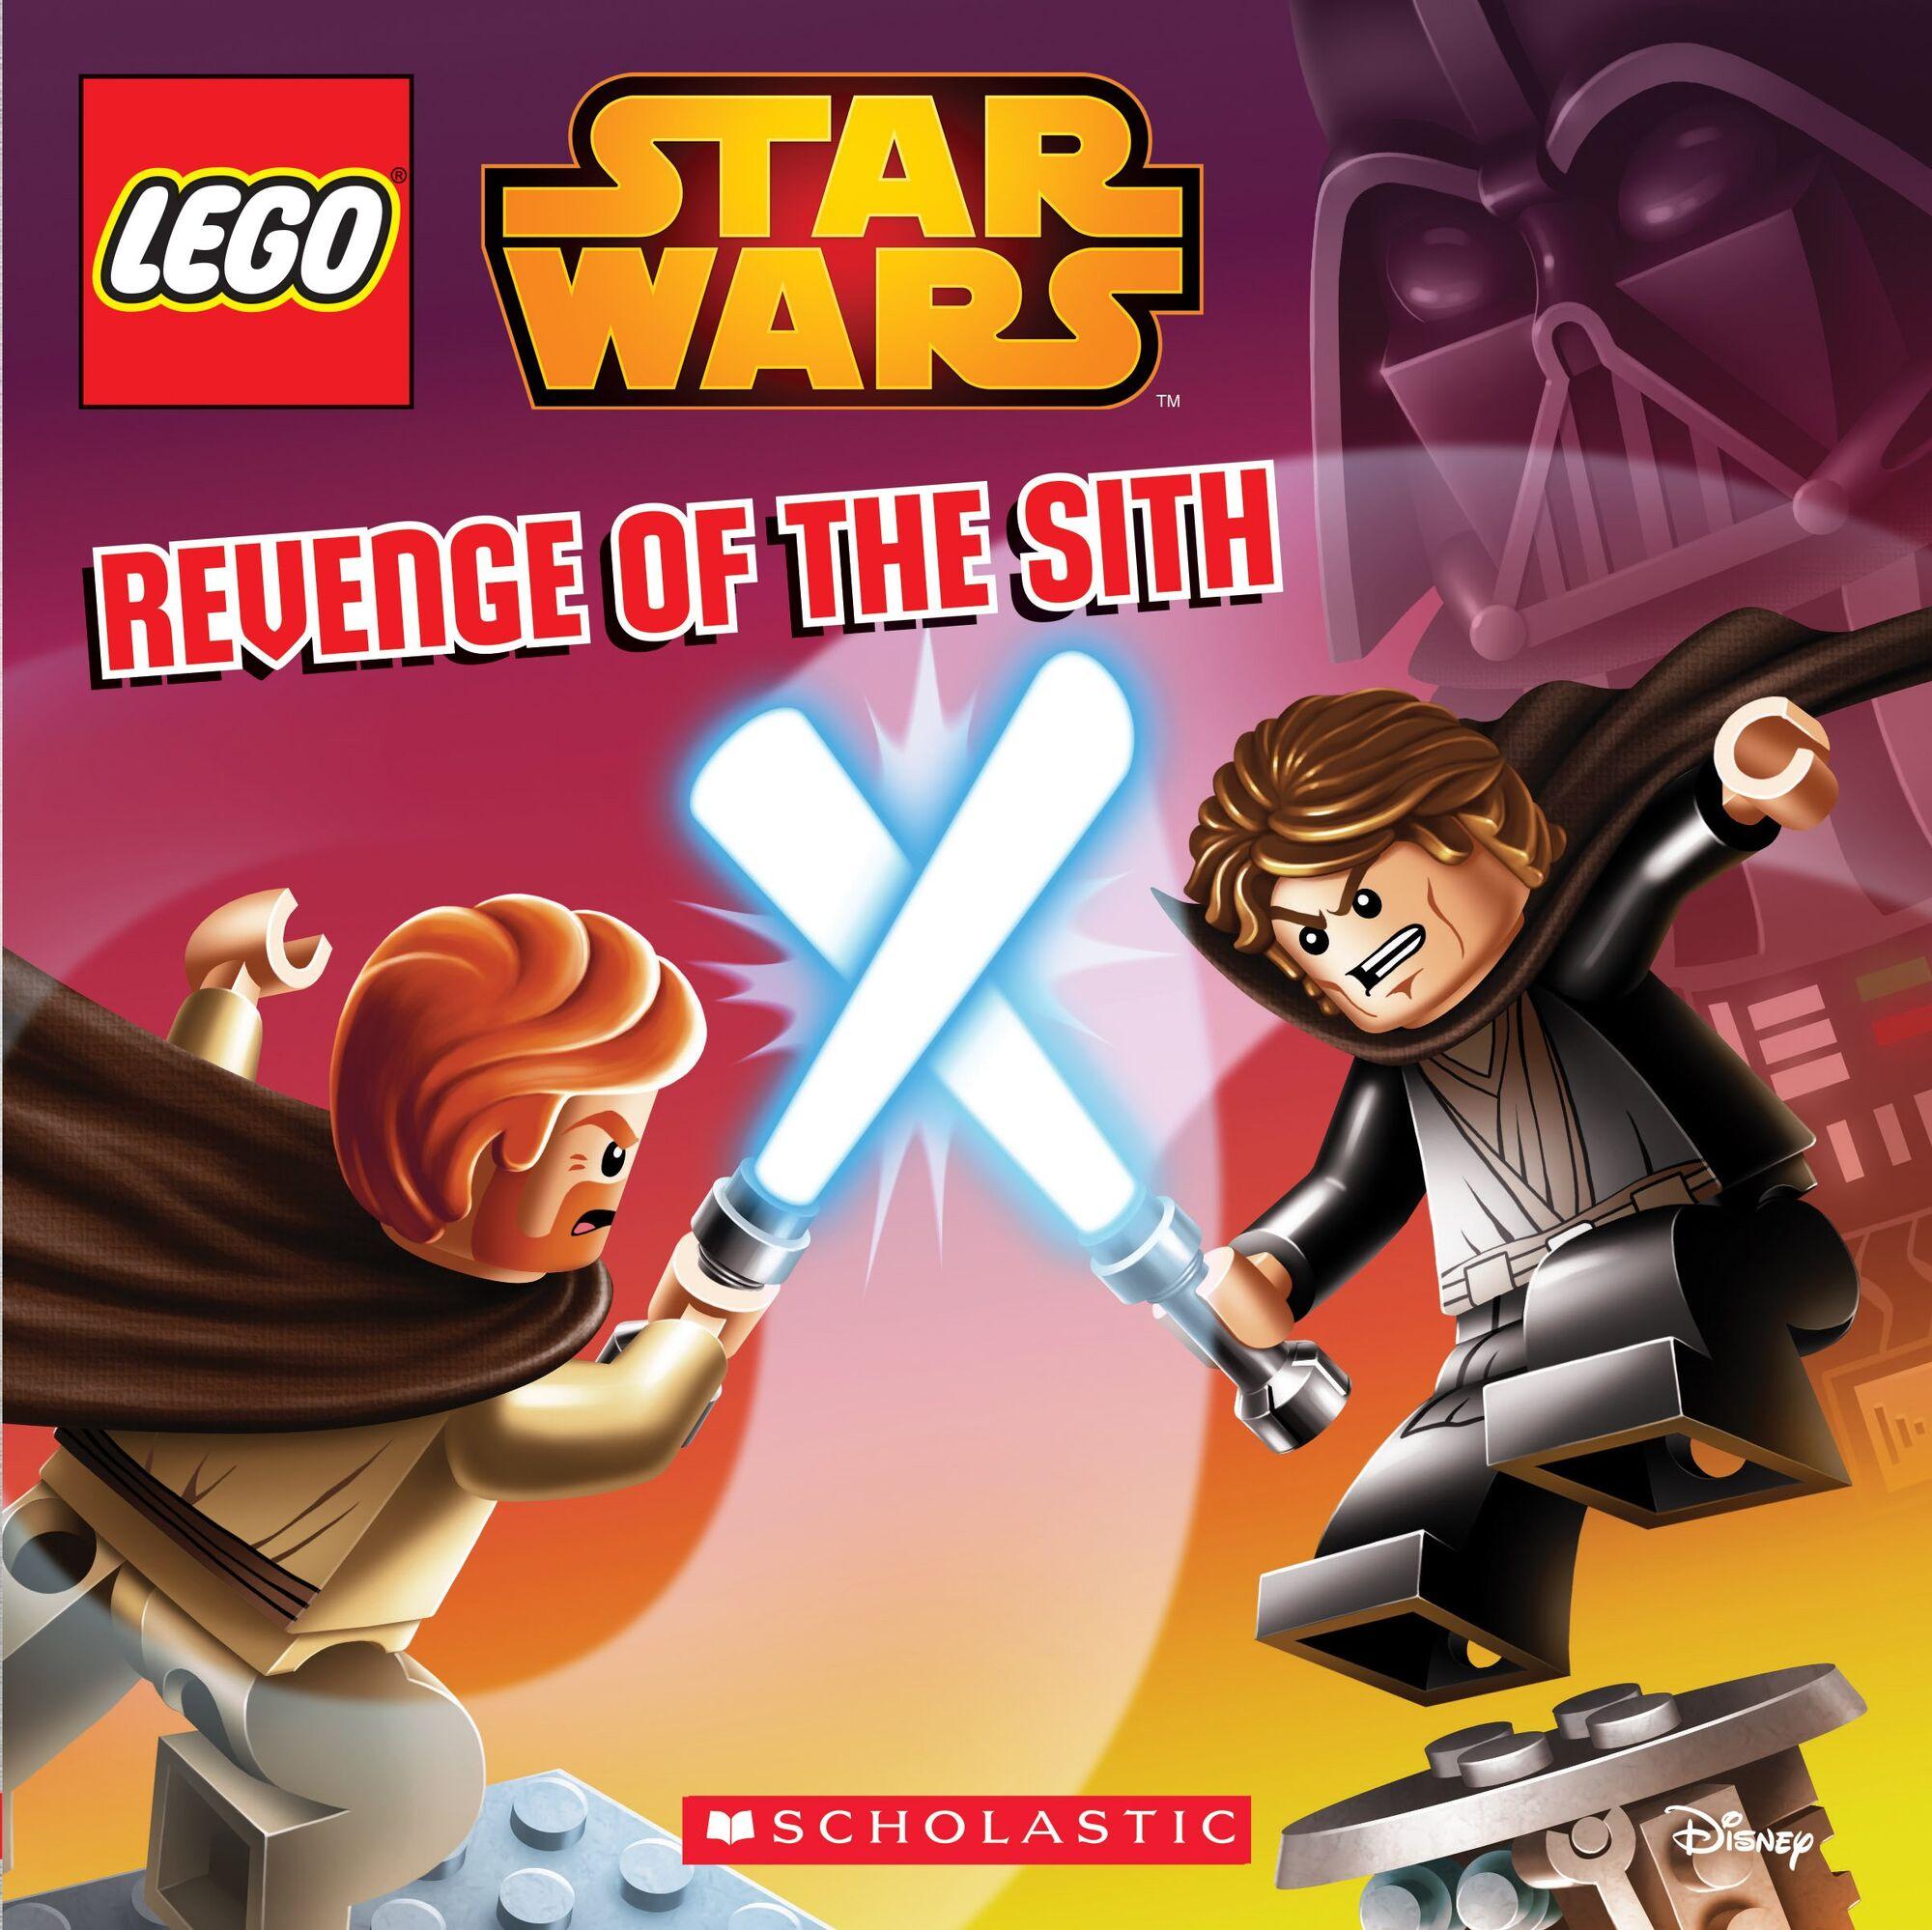 Star Wars, Episode III: Revenge of the Sith (2005) READ ...